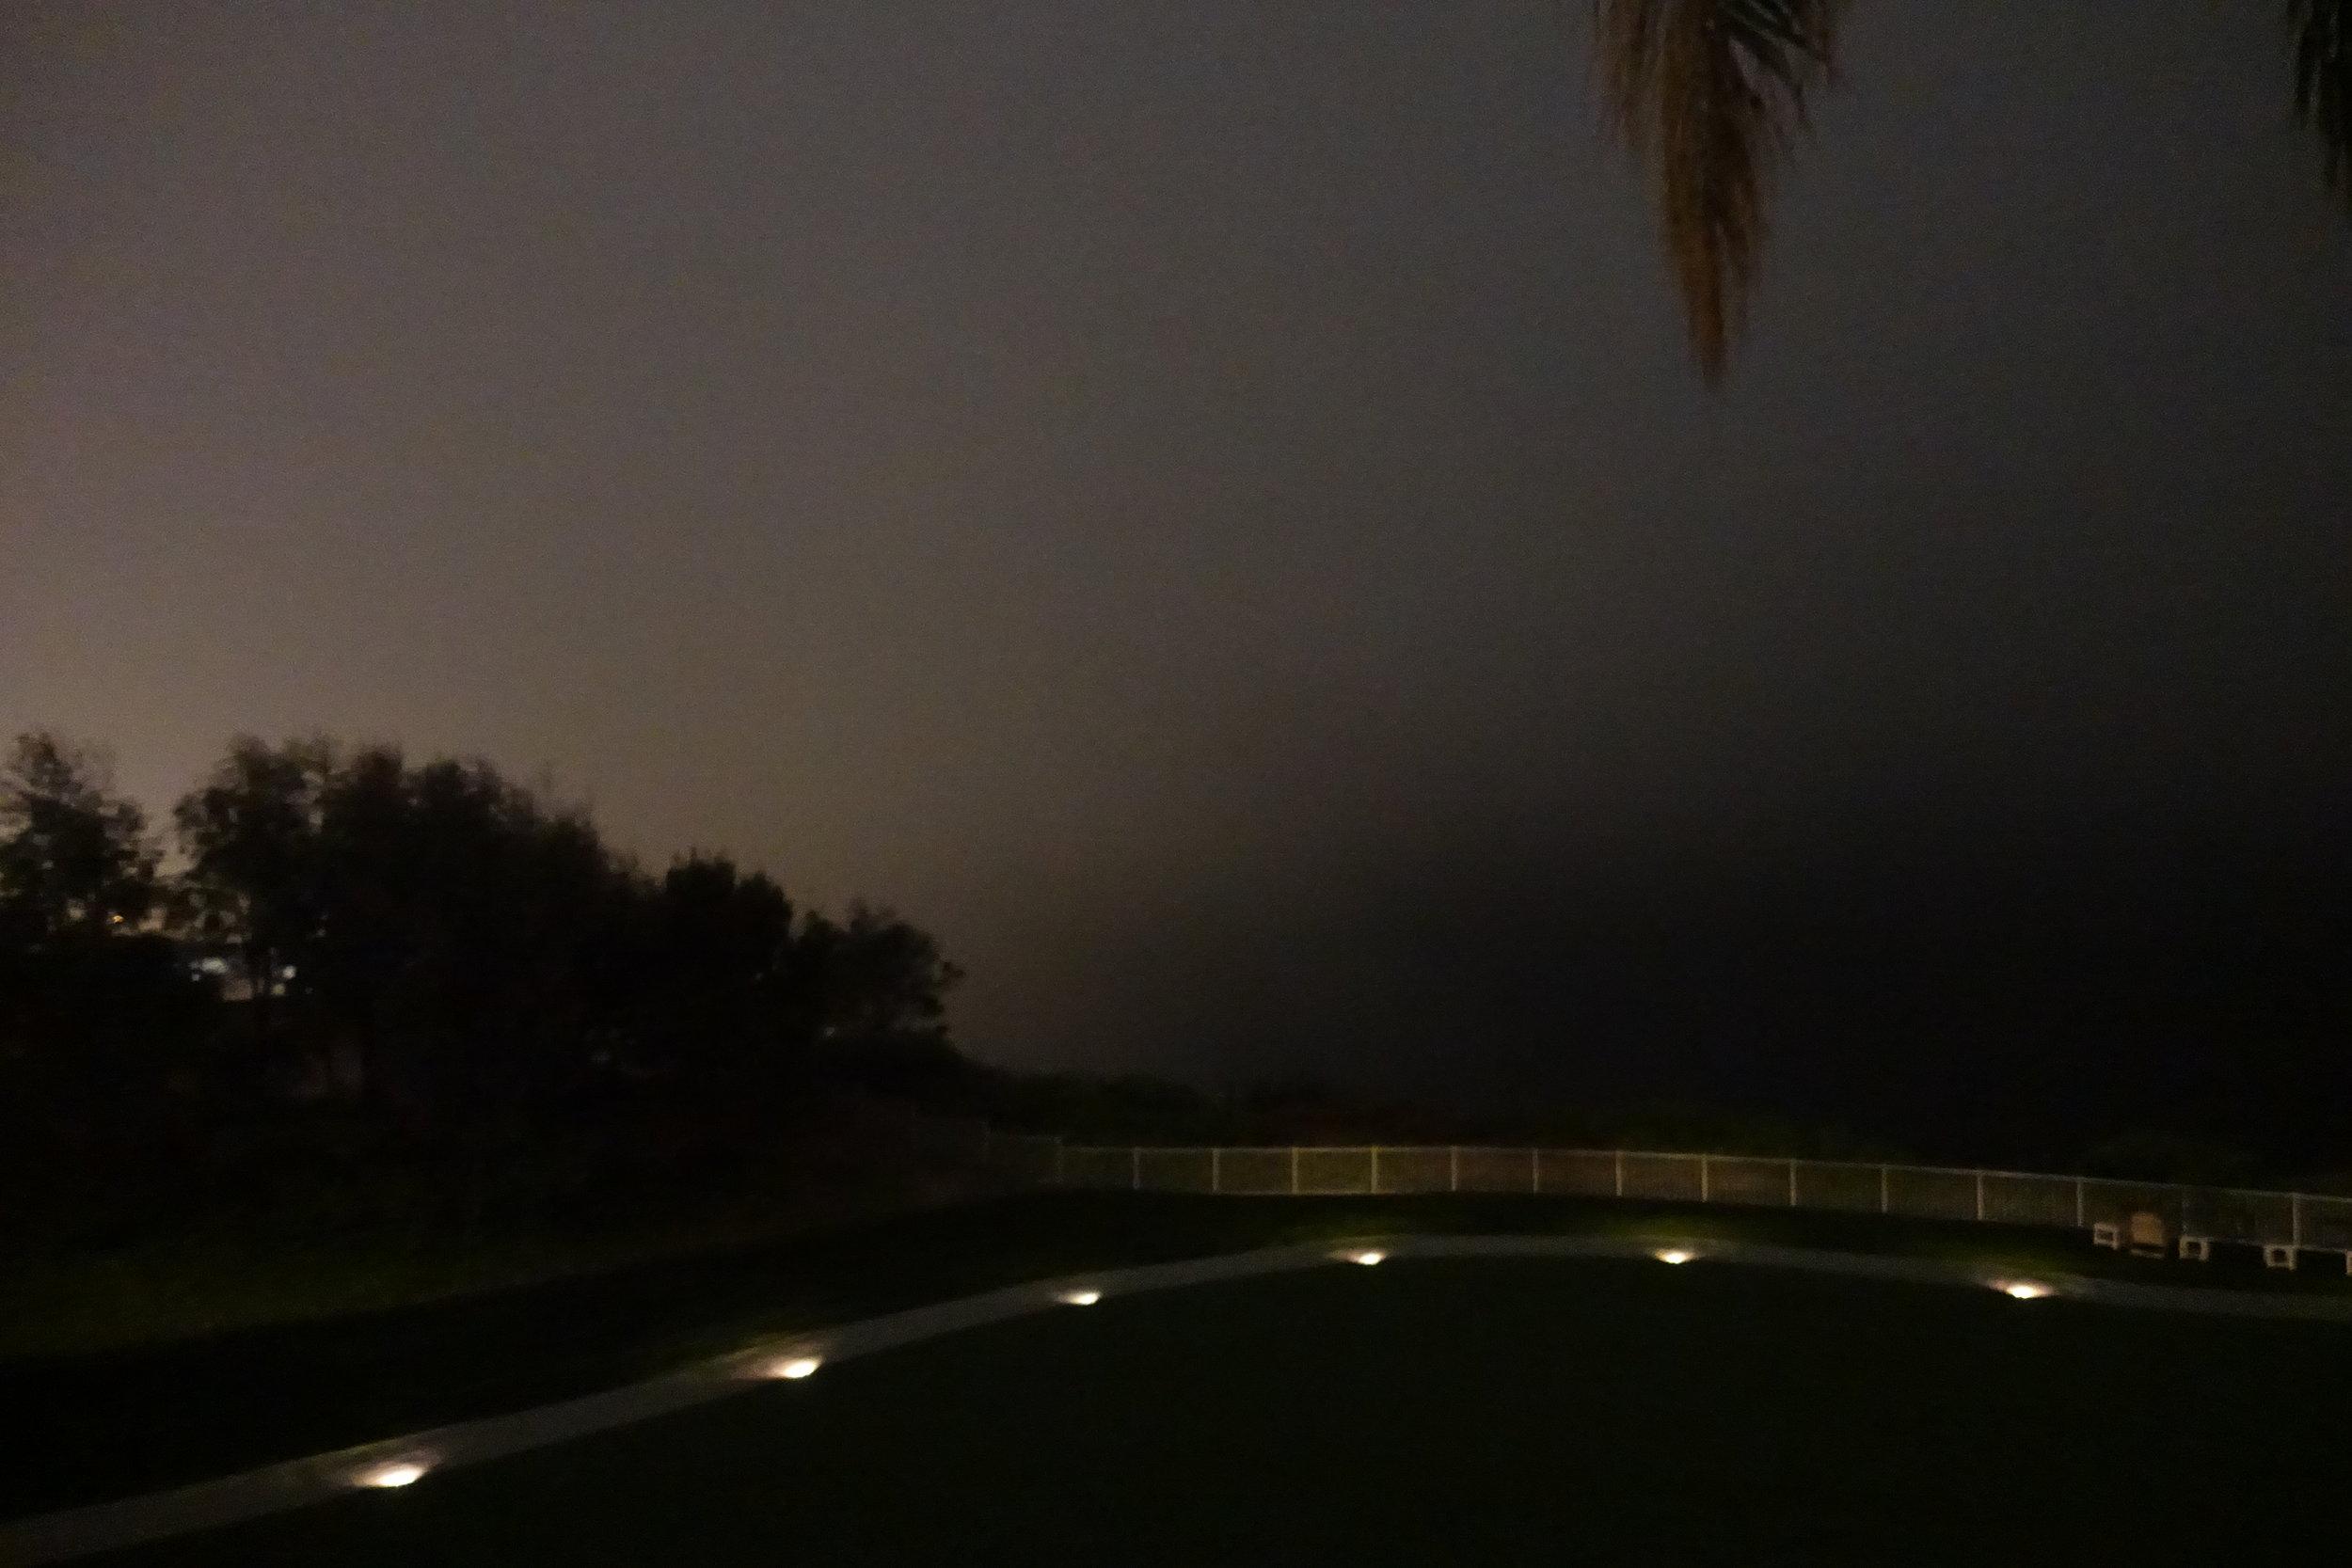 Night time ocean view